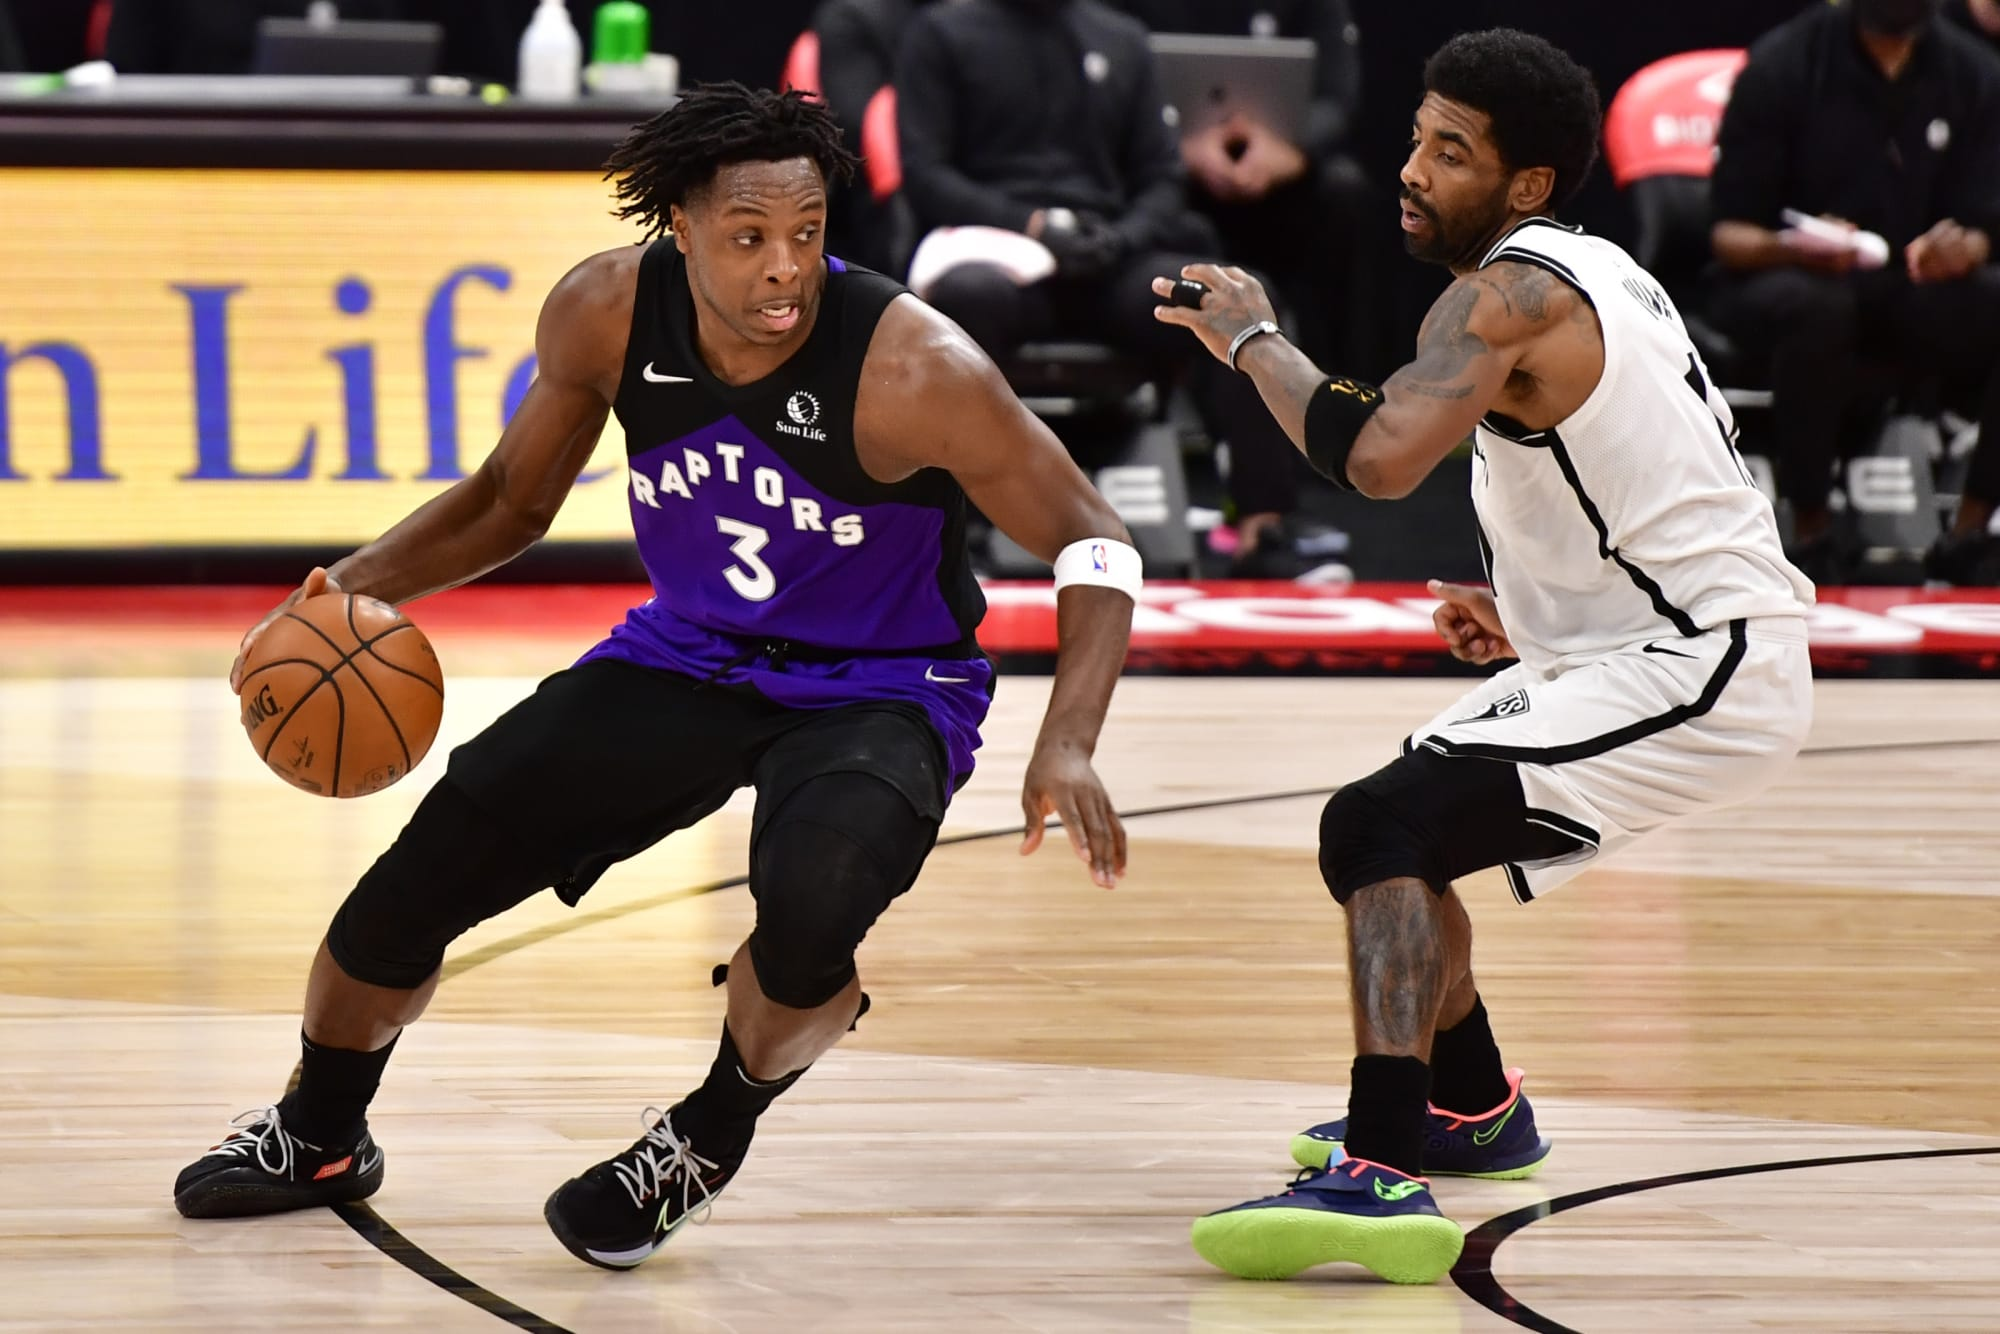 Toronto Raptors: 4 X-factors that could make or break 2021 season